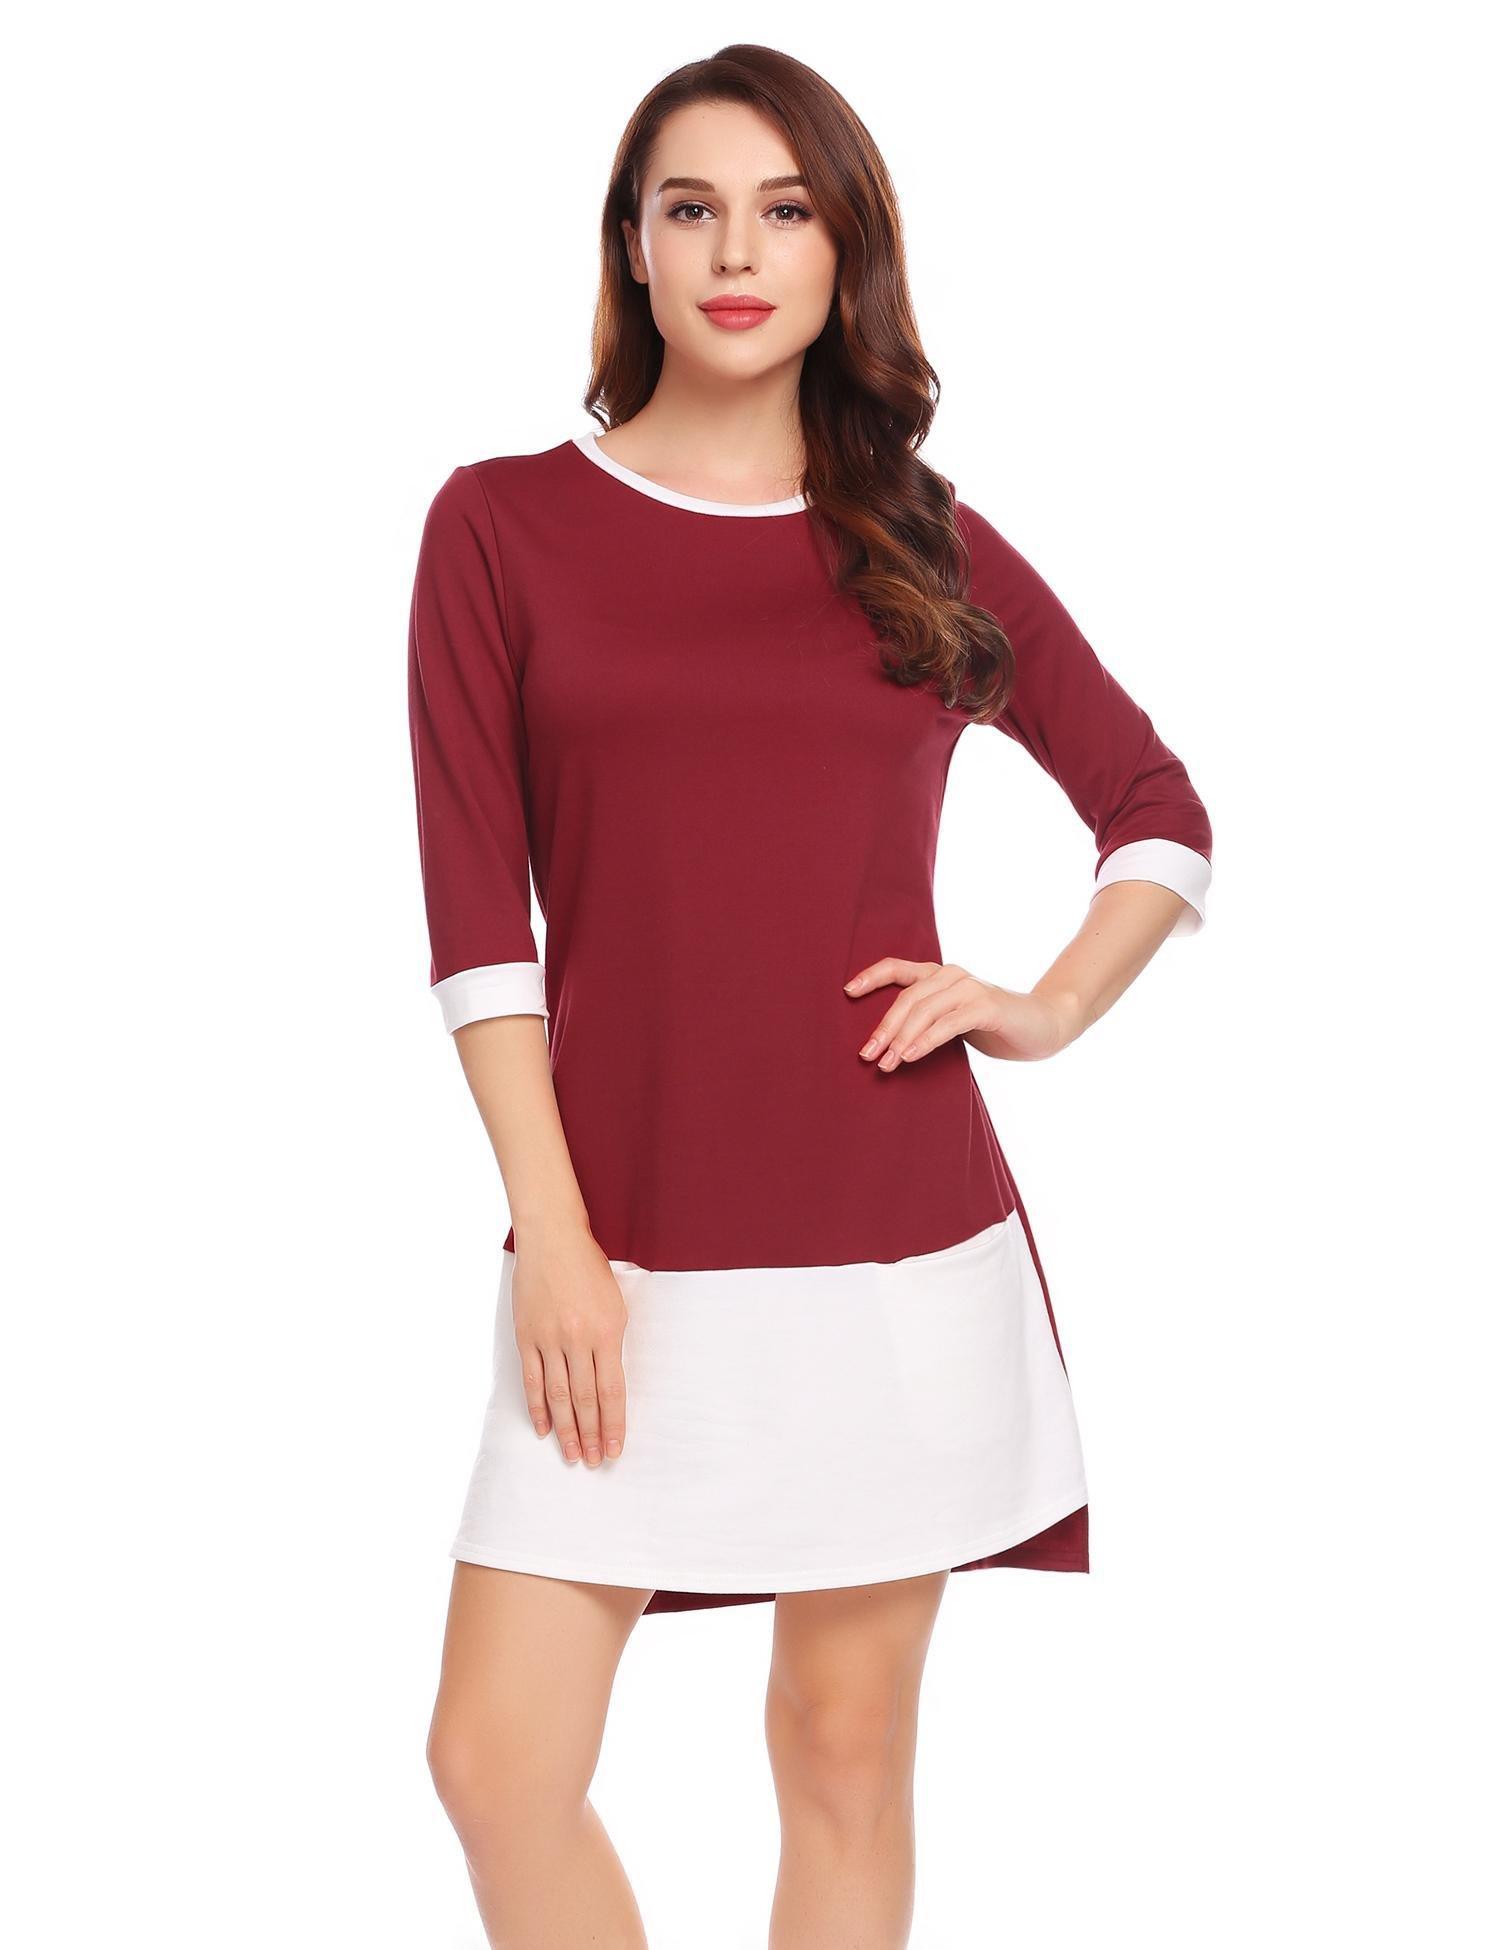 Unibelle Women's Patchwork Short Sleeve Shift Tunic Dress(Wine Red,L)